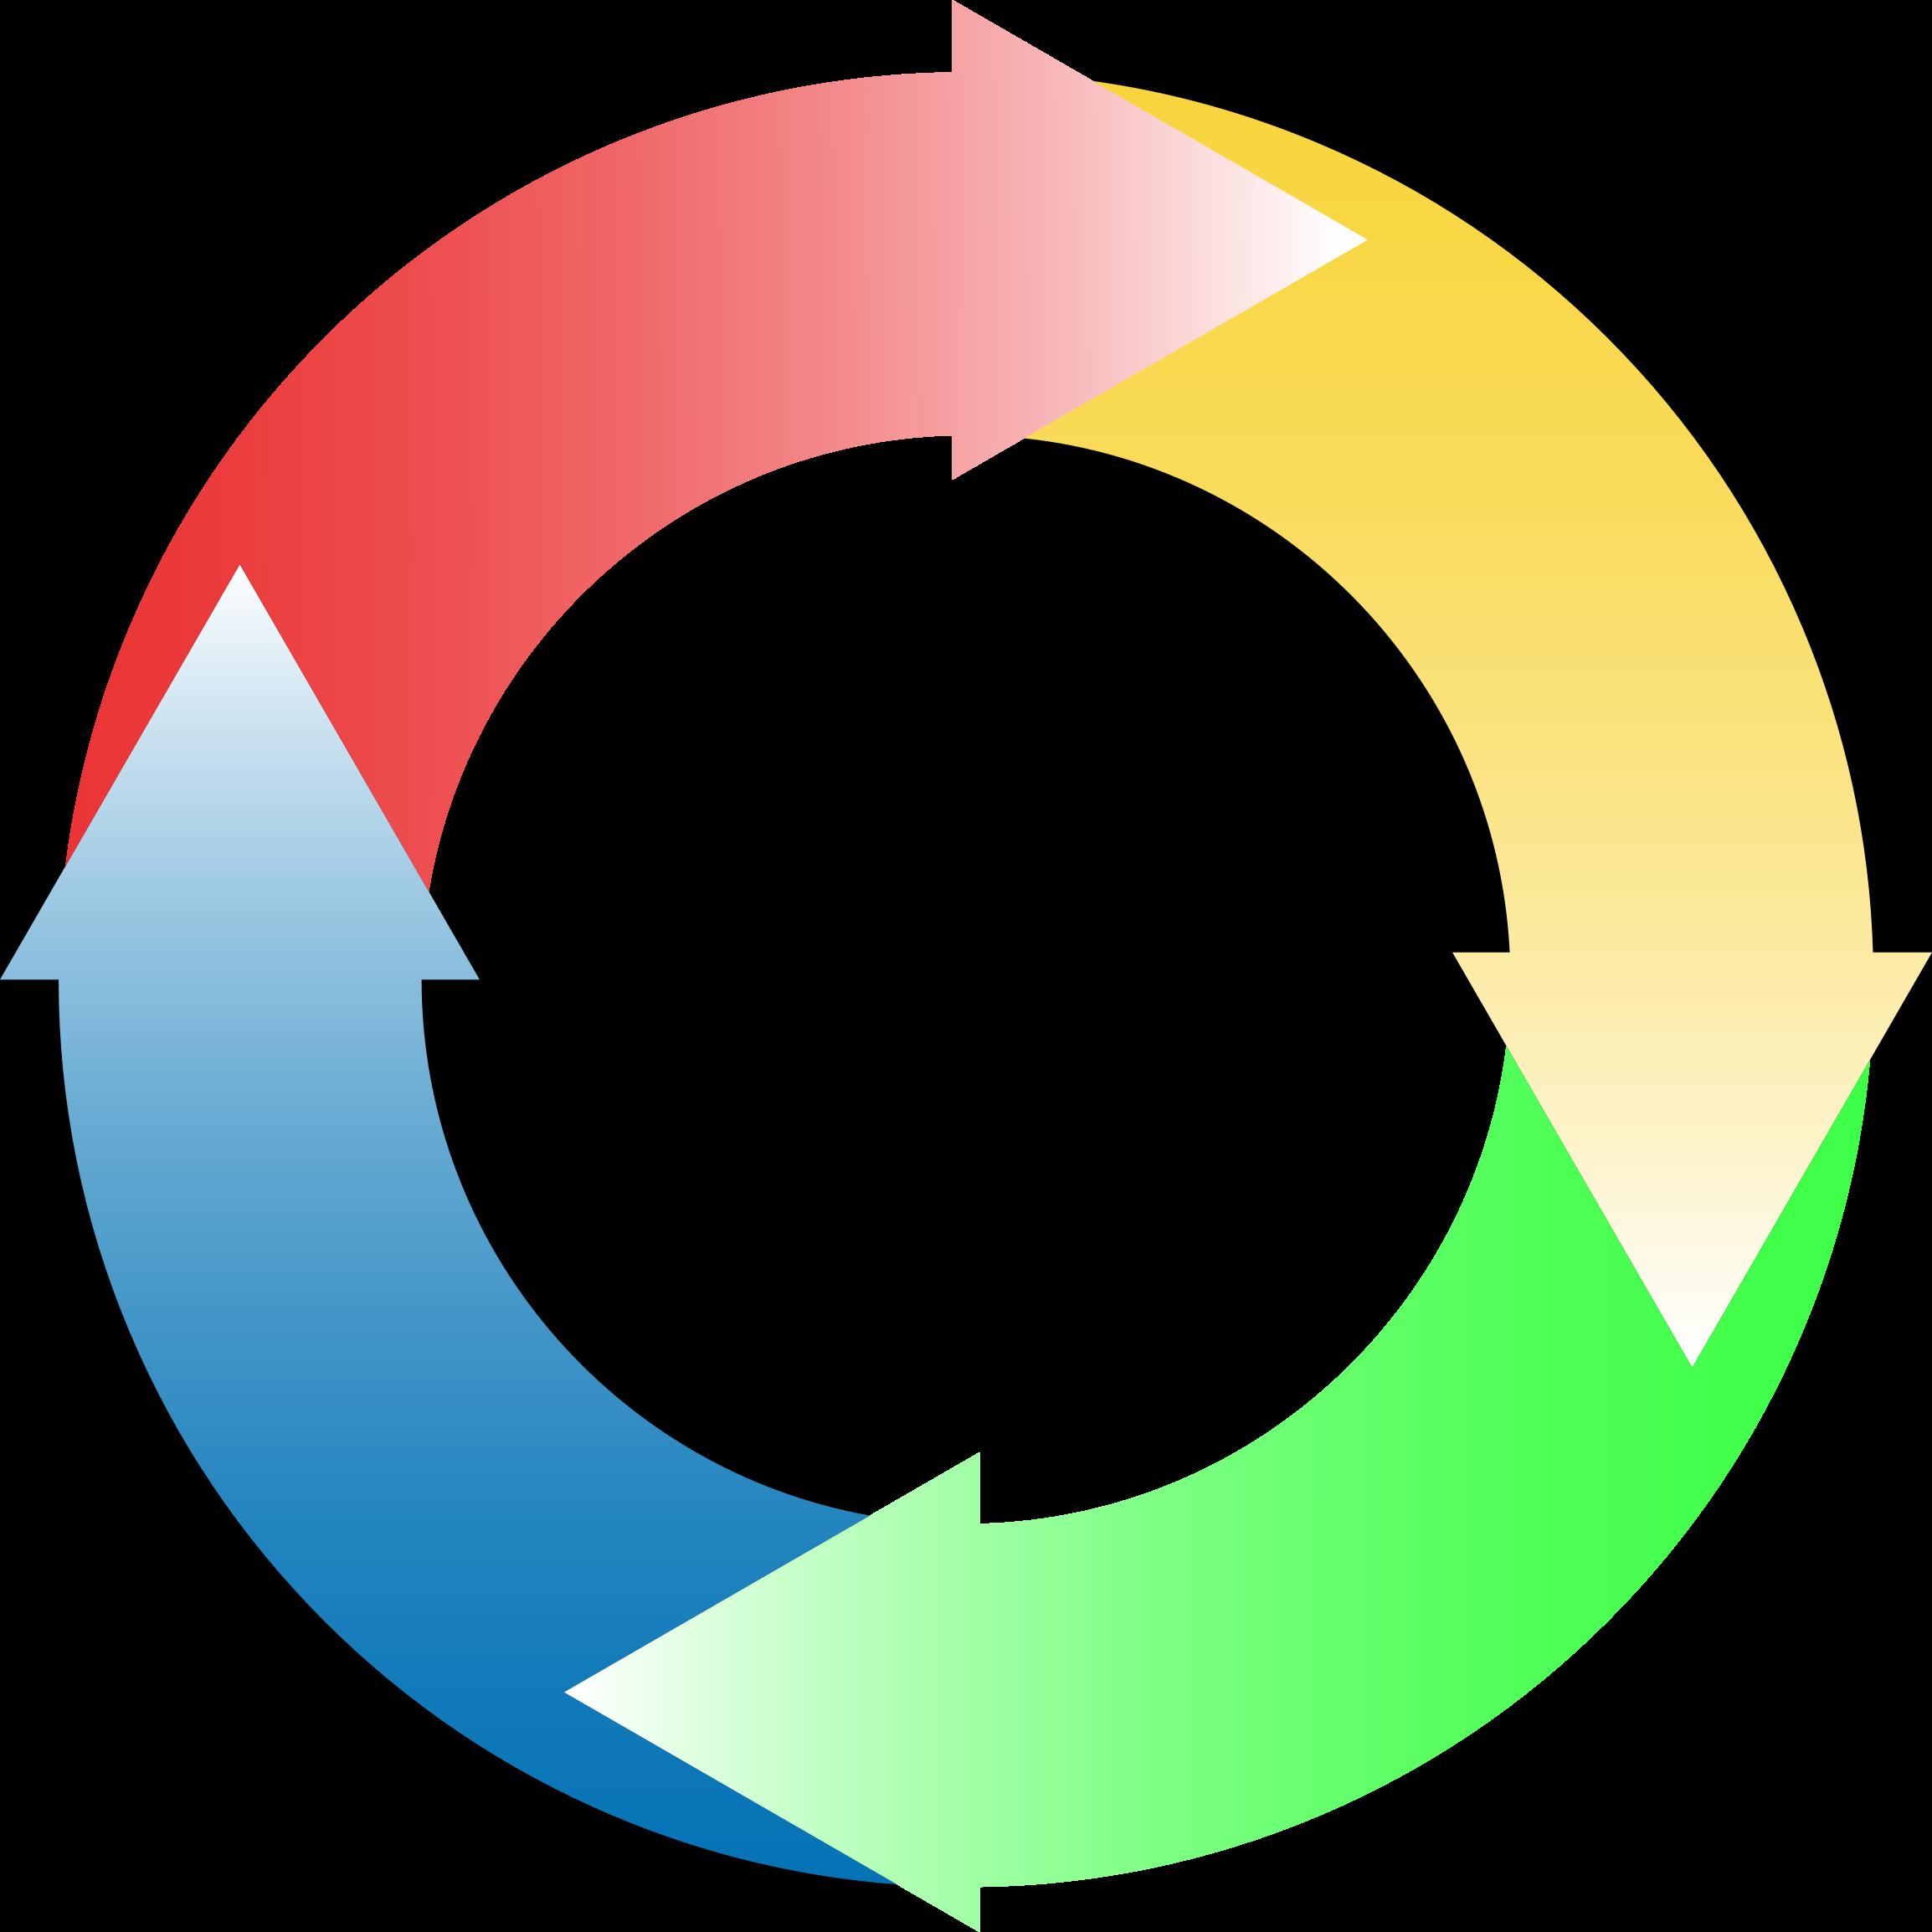 Circular Arrows.